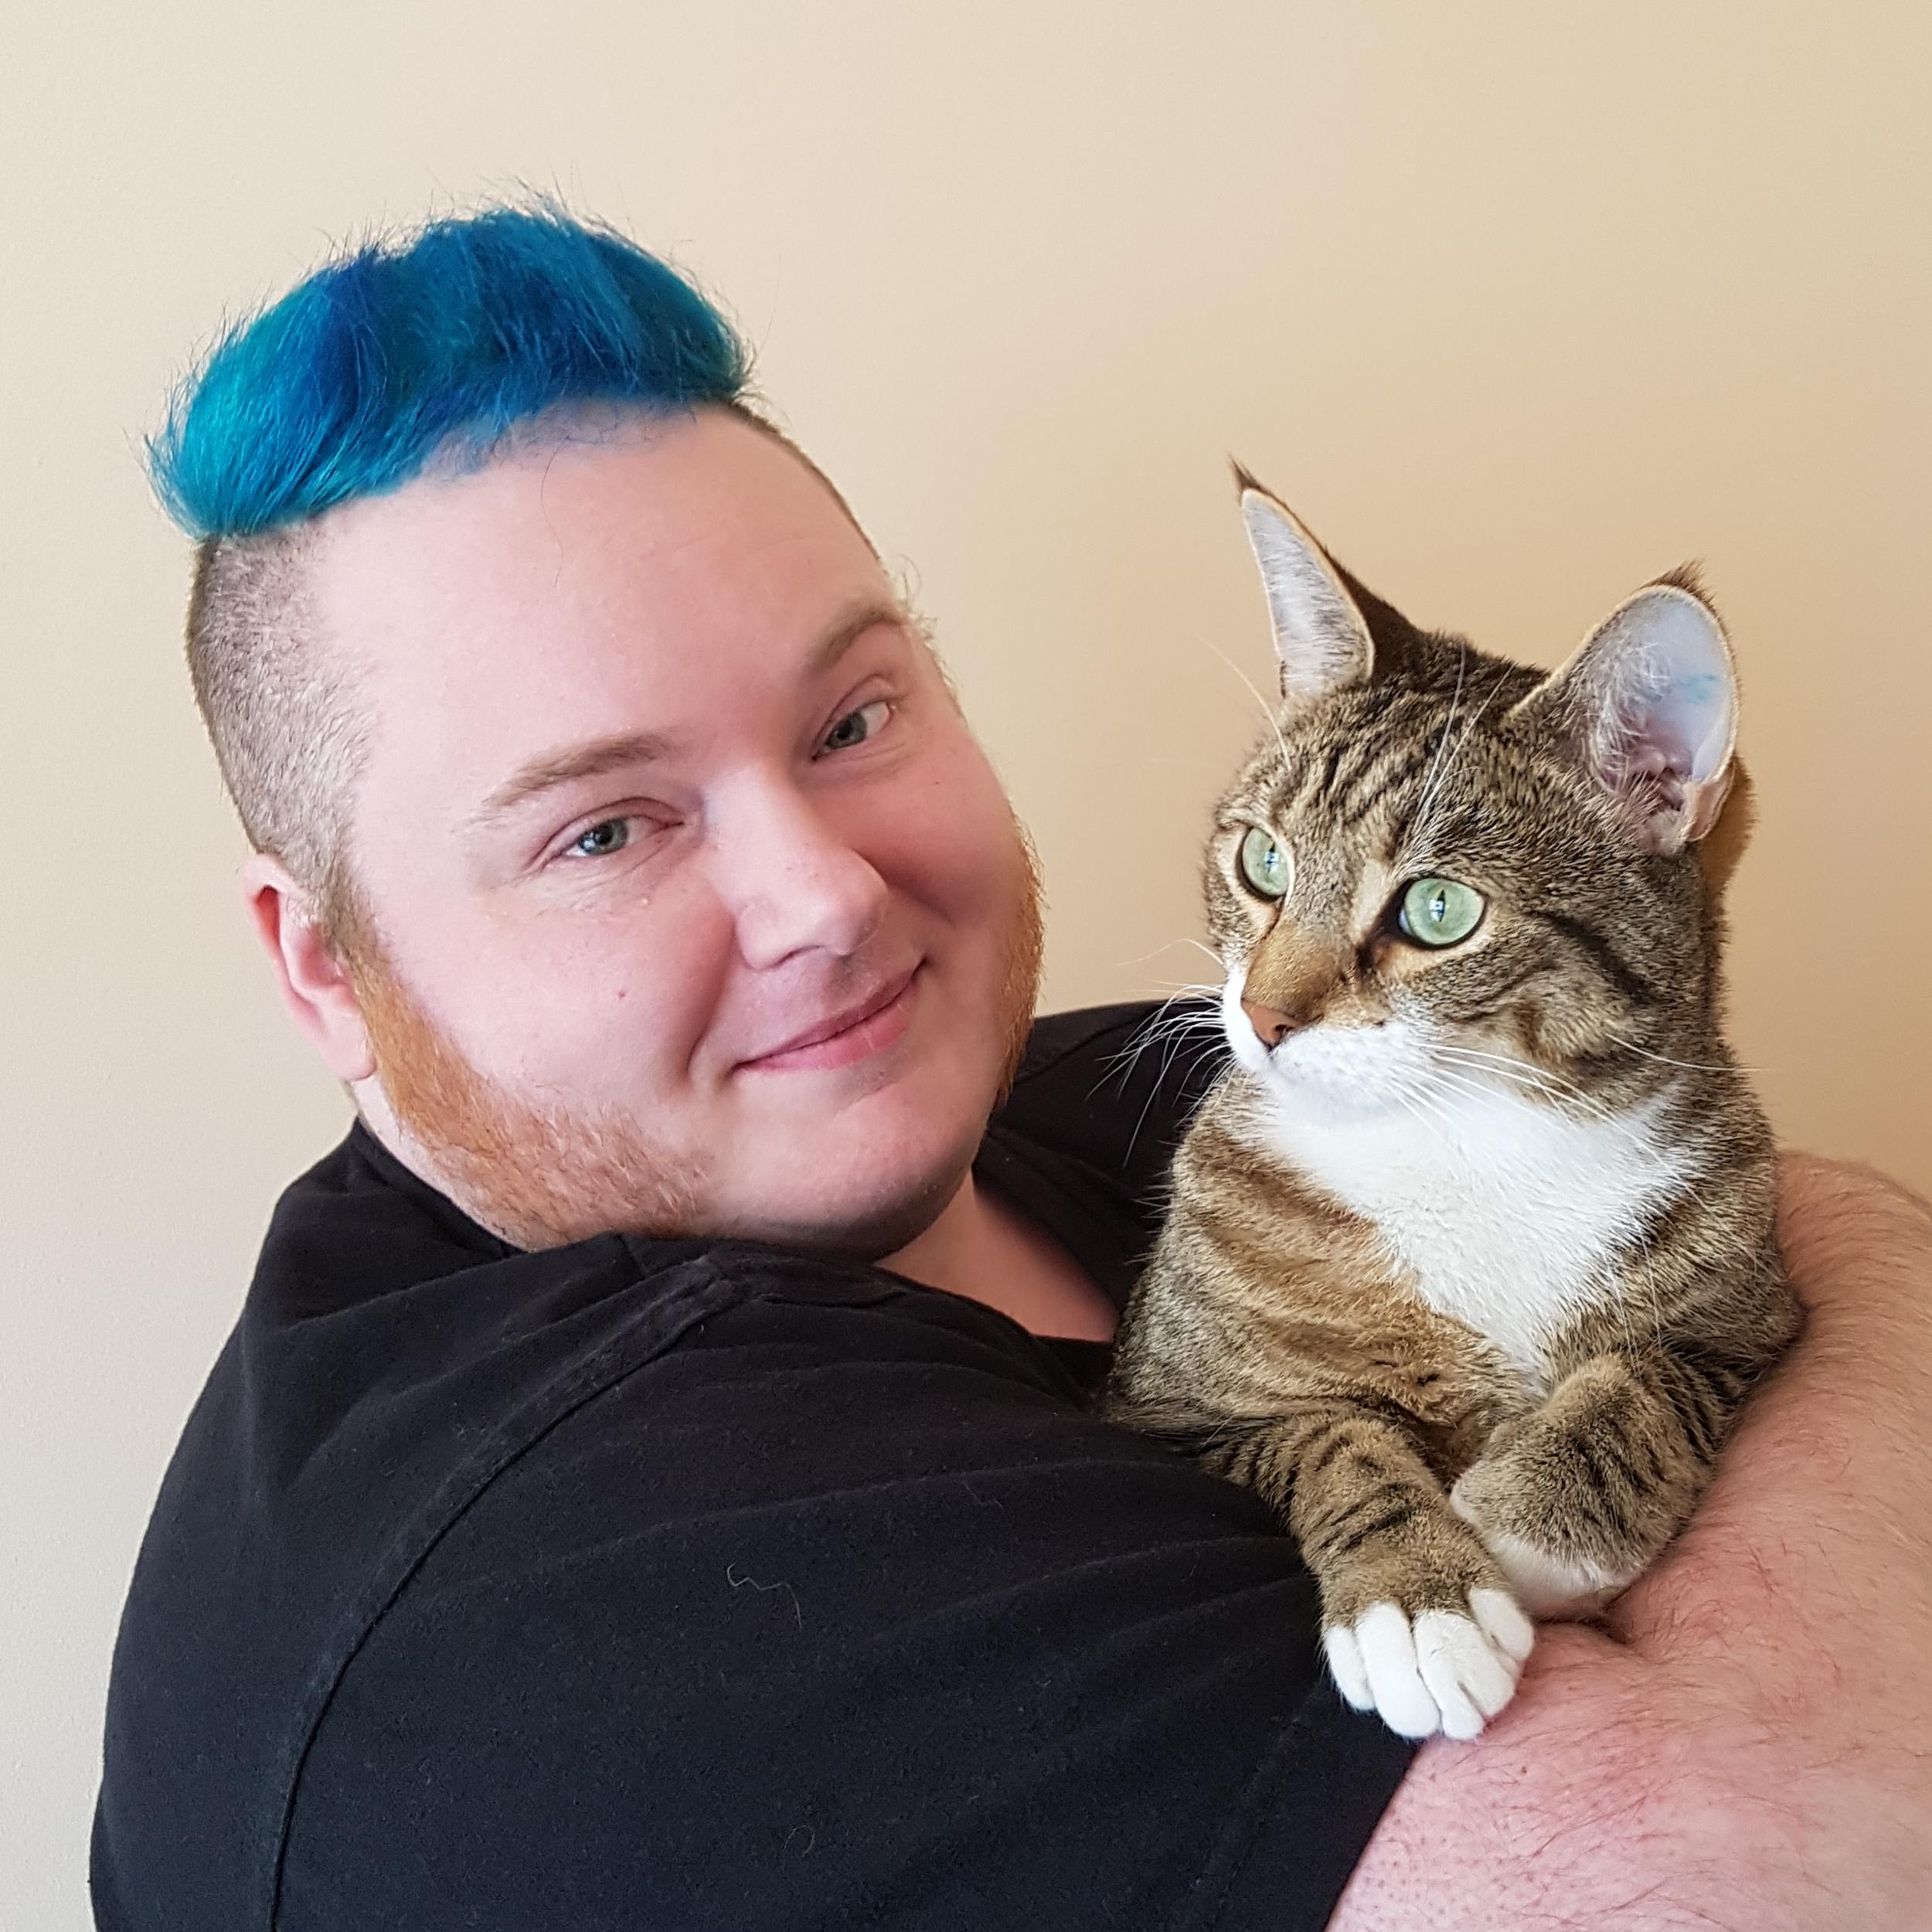 Erin Kyan, holding his cat, Boop.